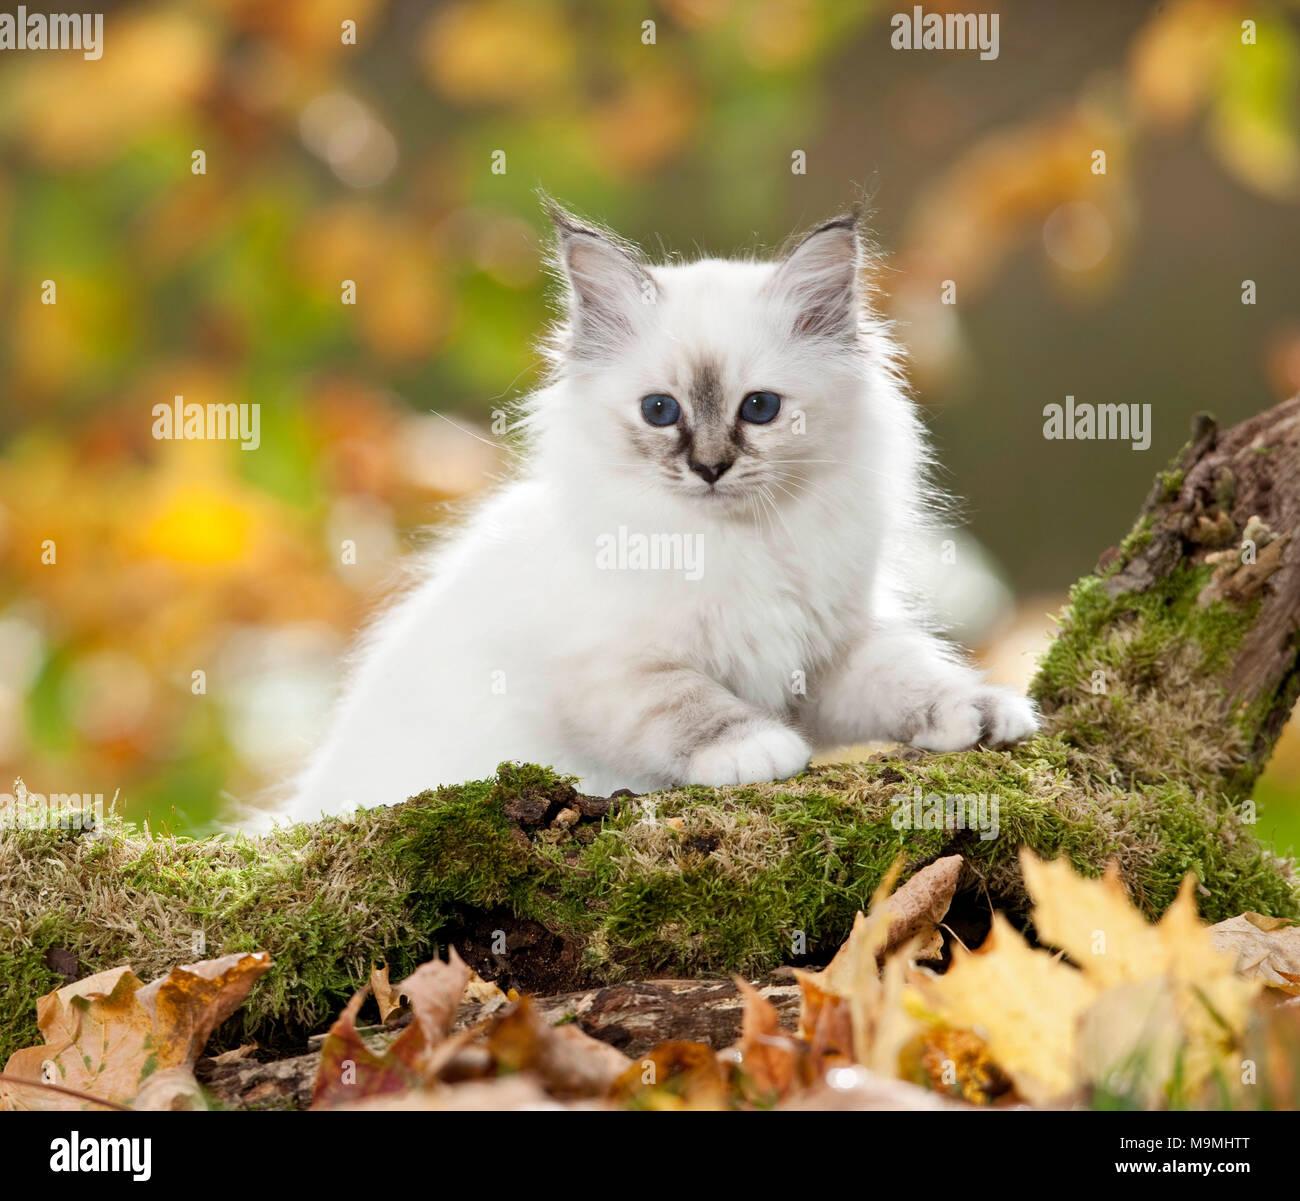 Sacred Birman. Kitten behind a a mossy log. Germany - Stock Image